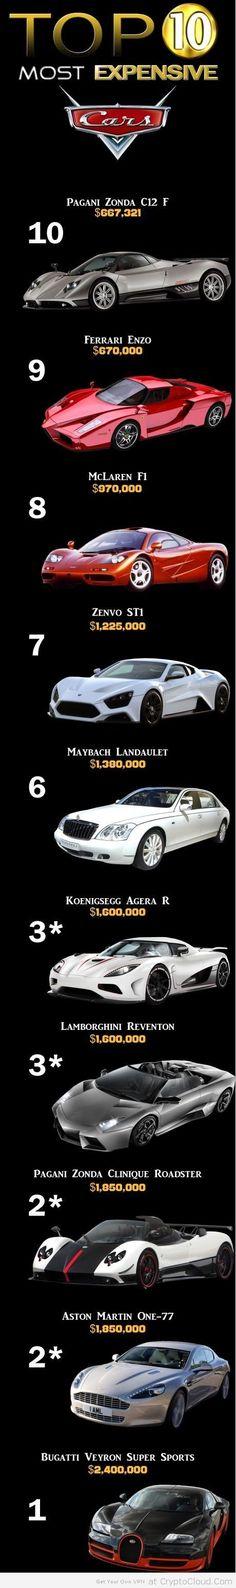 Badass Cars Top 10